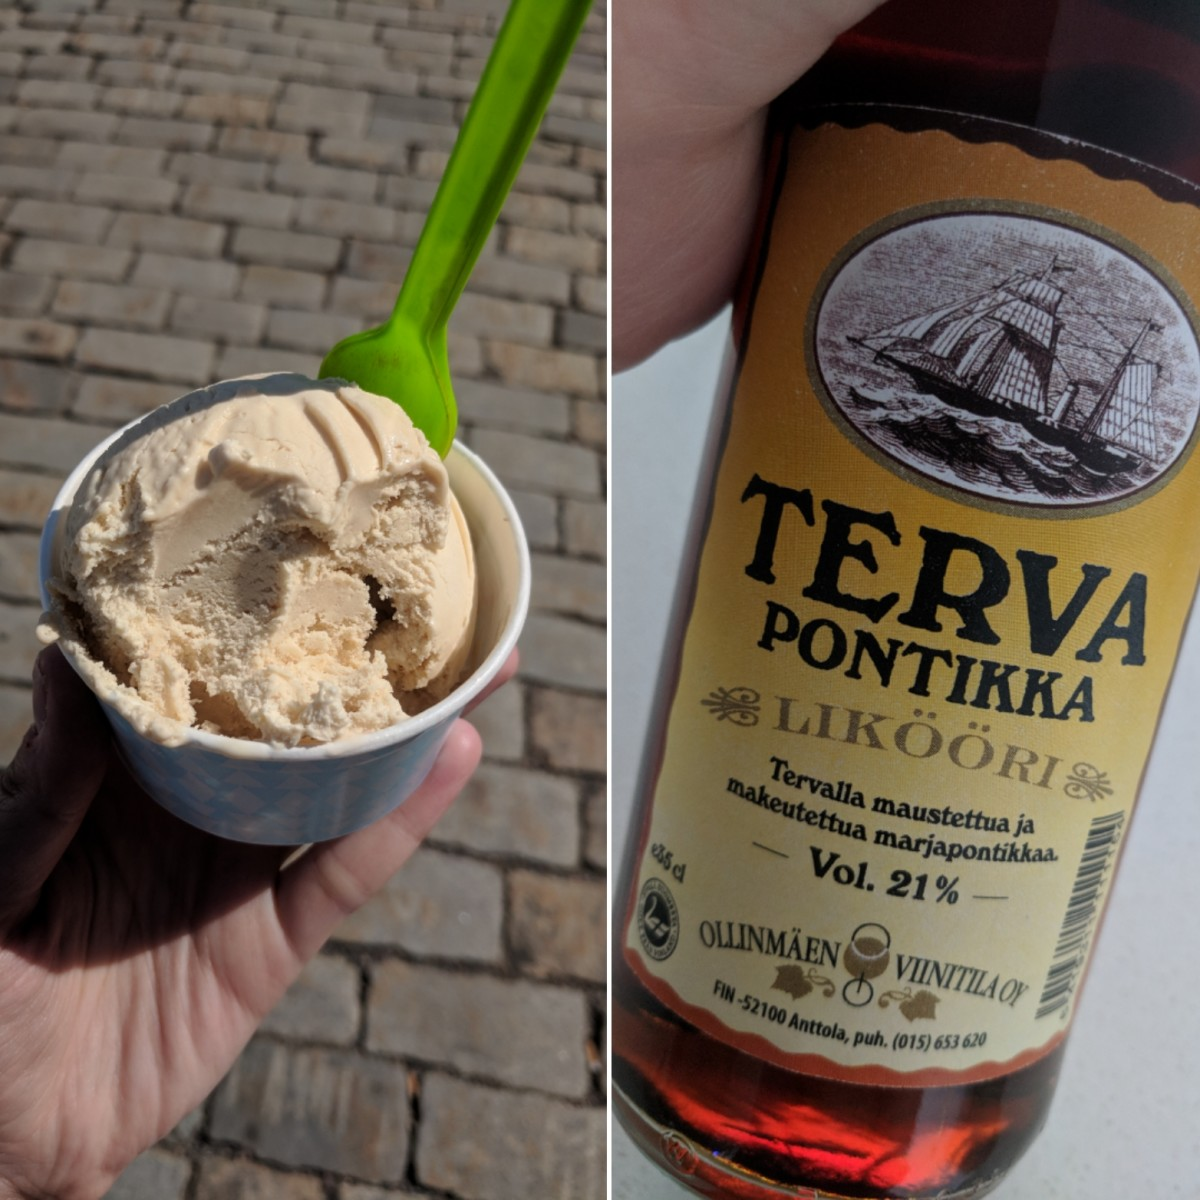 Terva ice cream and liqueur.